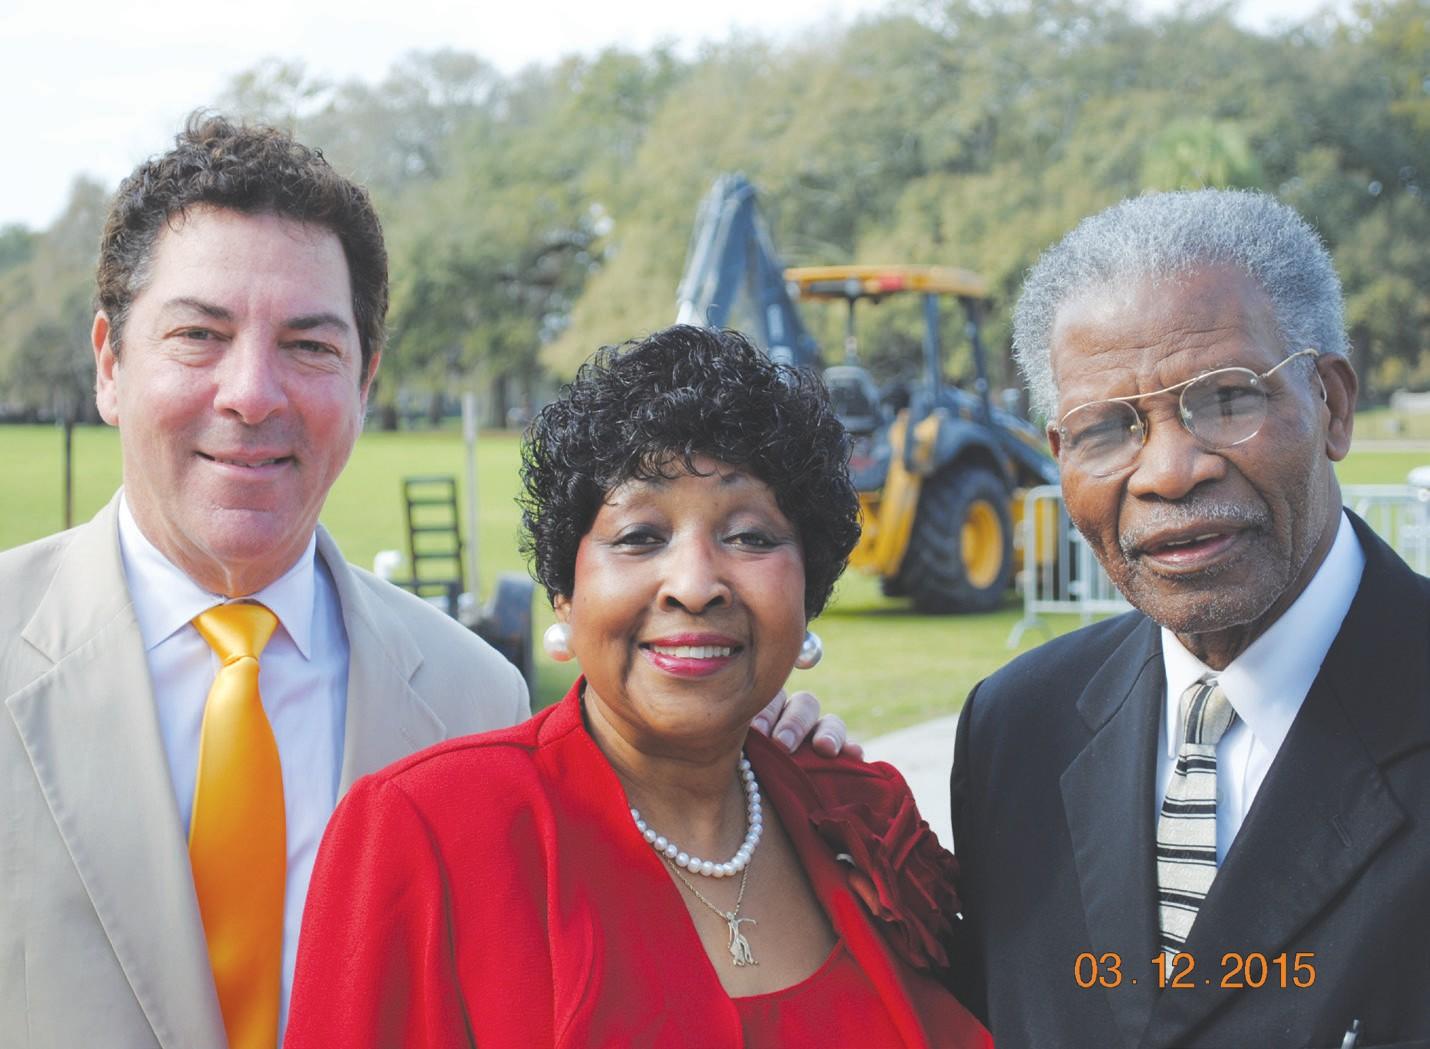 (L to R) Scott Center, Mayor Edna Jackson and Rev. Mathew Southall Brown, Sr.